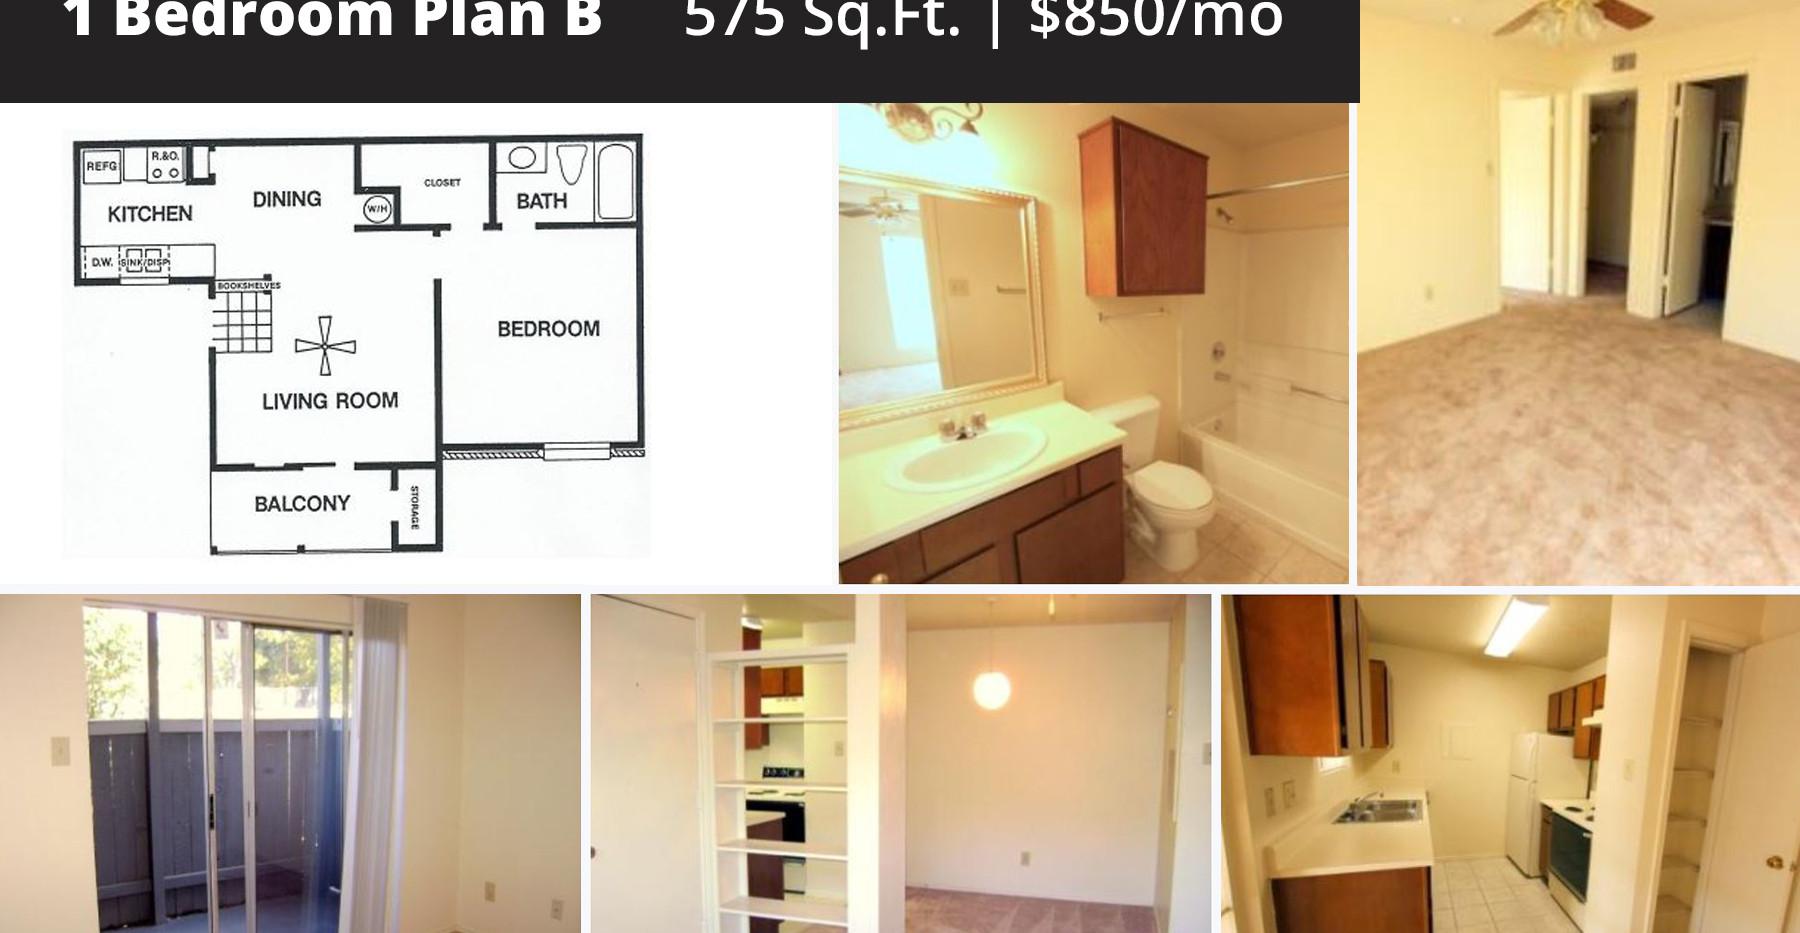 1 bedroom floor layout plan b.jpg